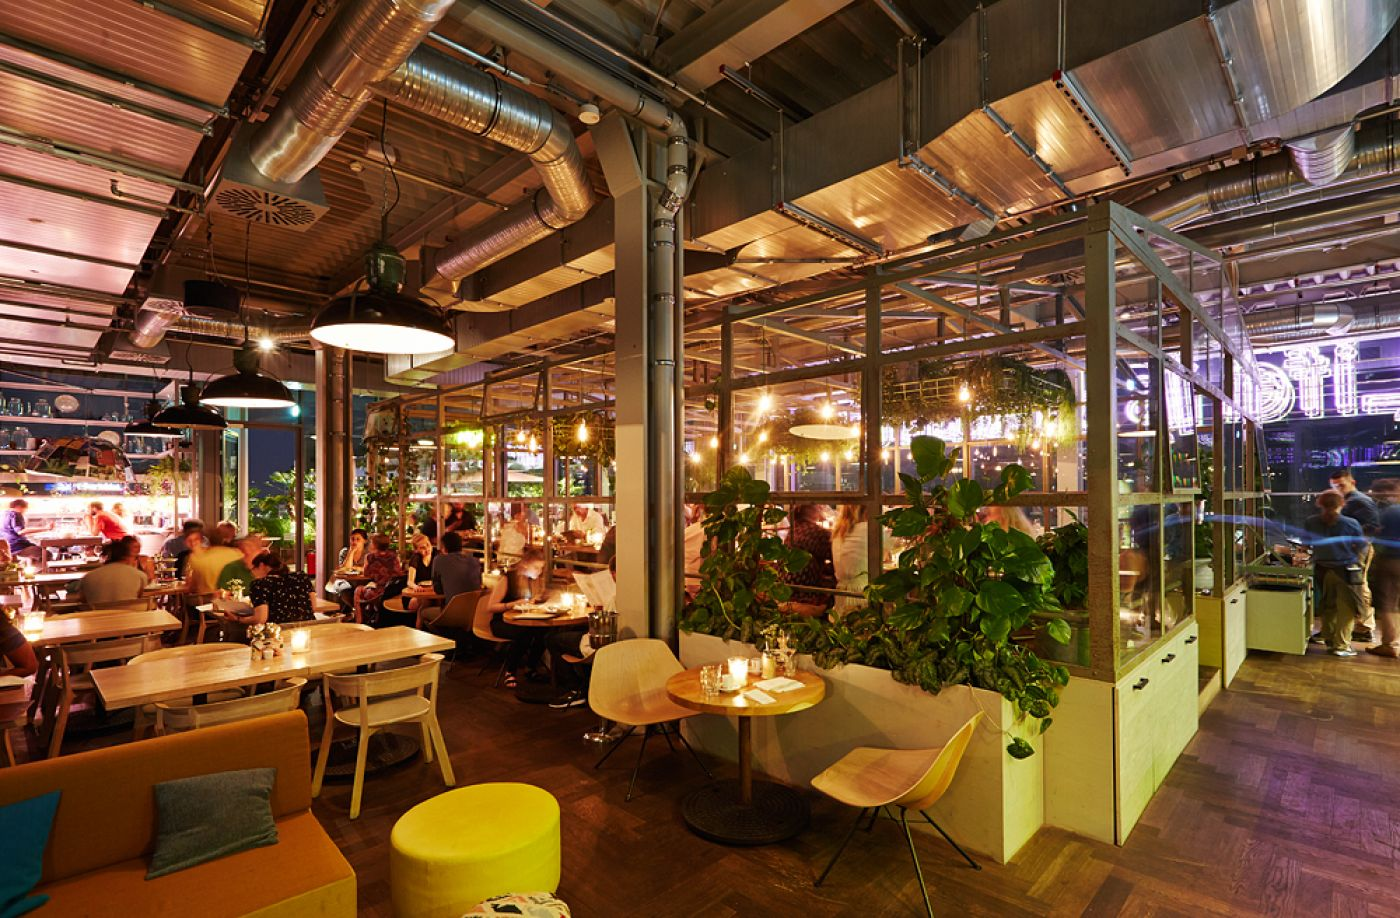 25hours hotel bikini berlin neni restaurant. Black Bedroom Furniture Sets. Home Design Ideas